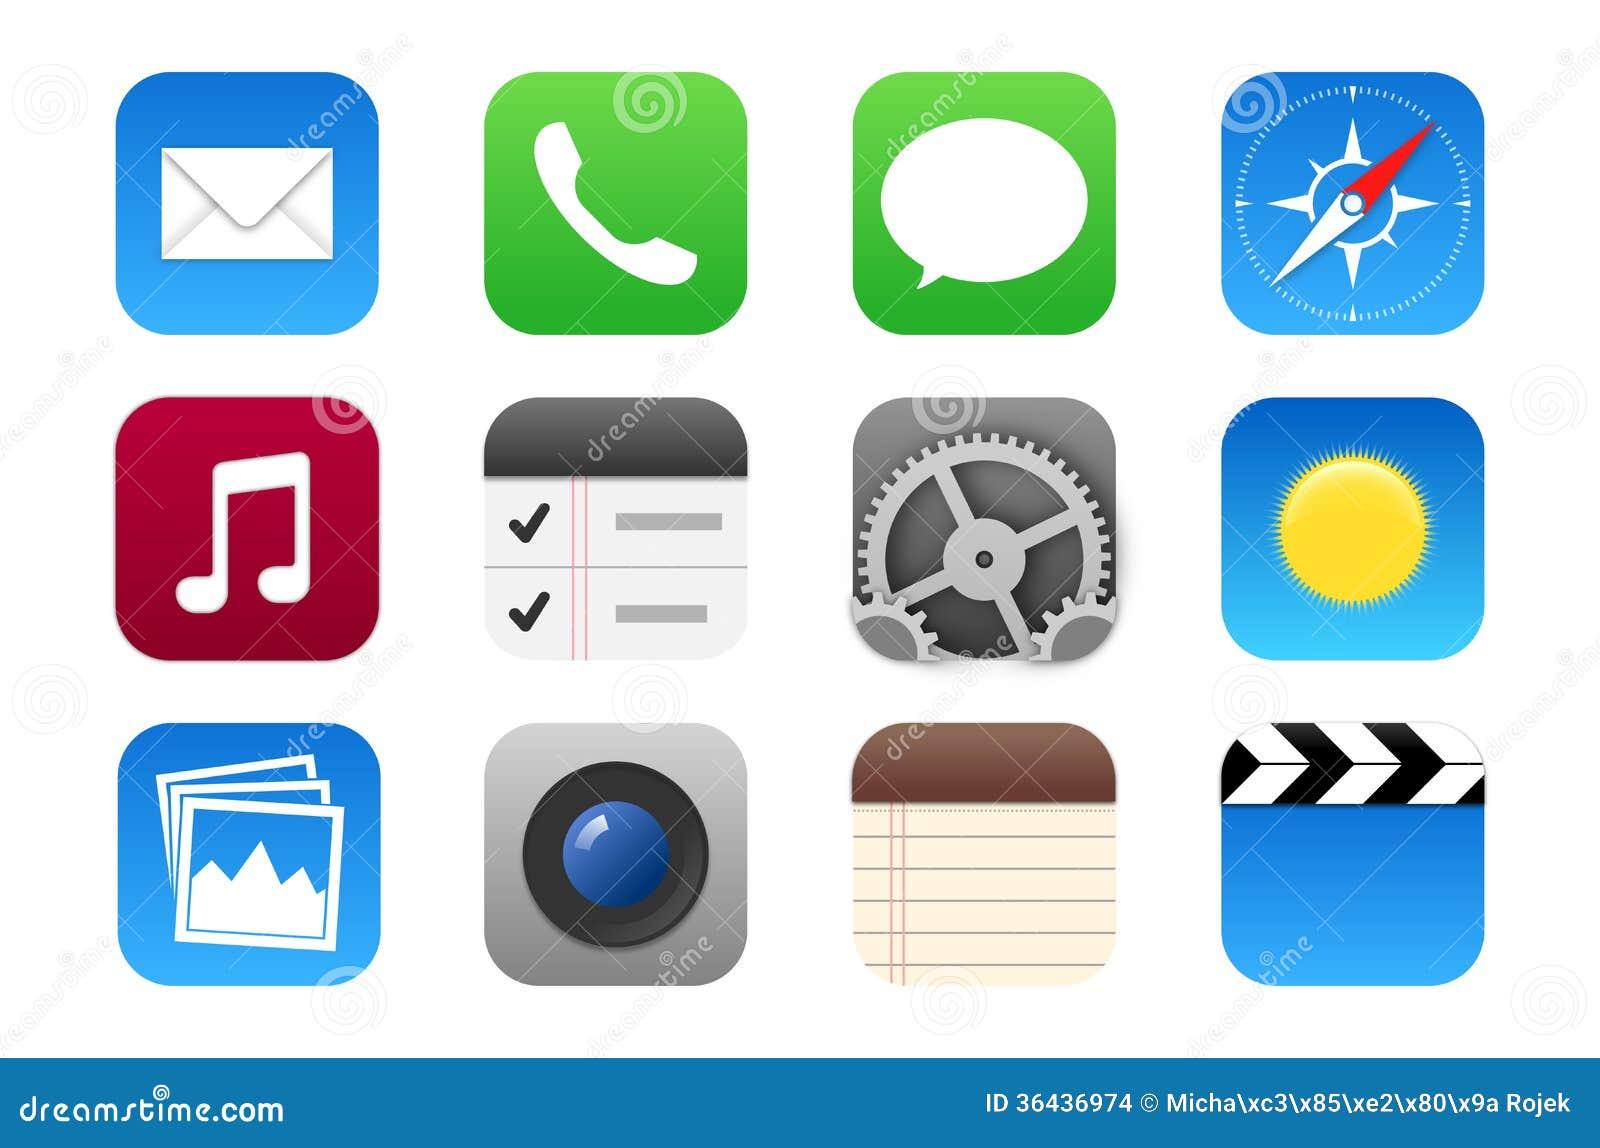 Icona Di Multimedia Messa Per I Telefoni Cellulari Ed I